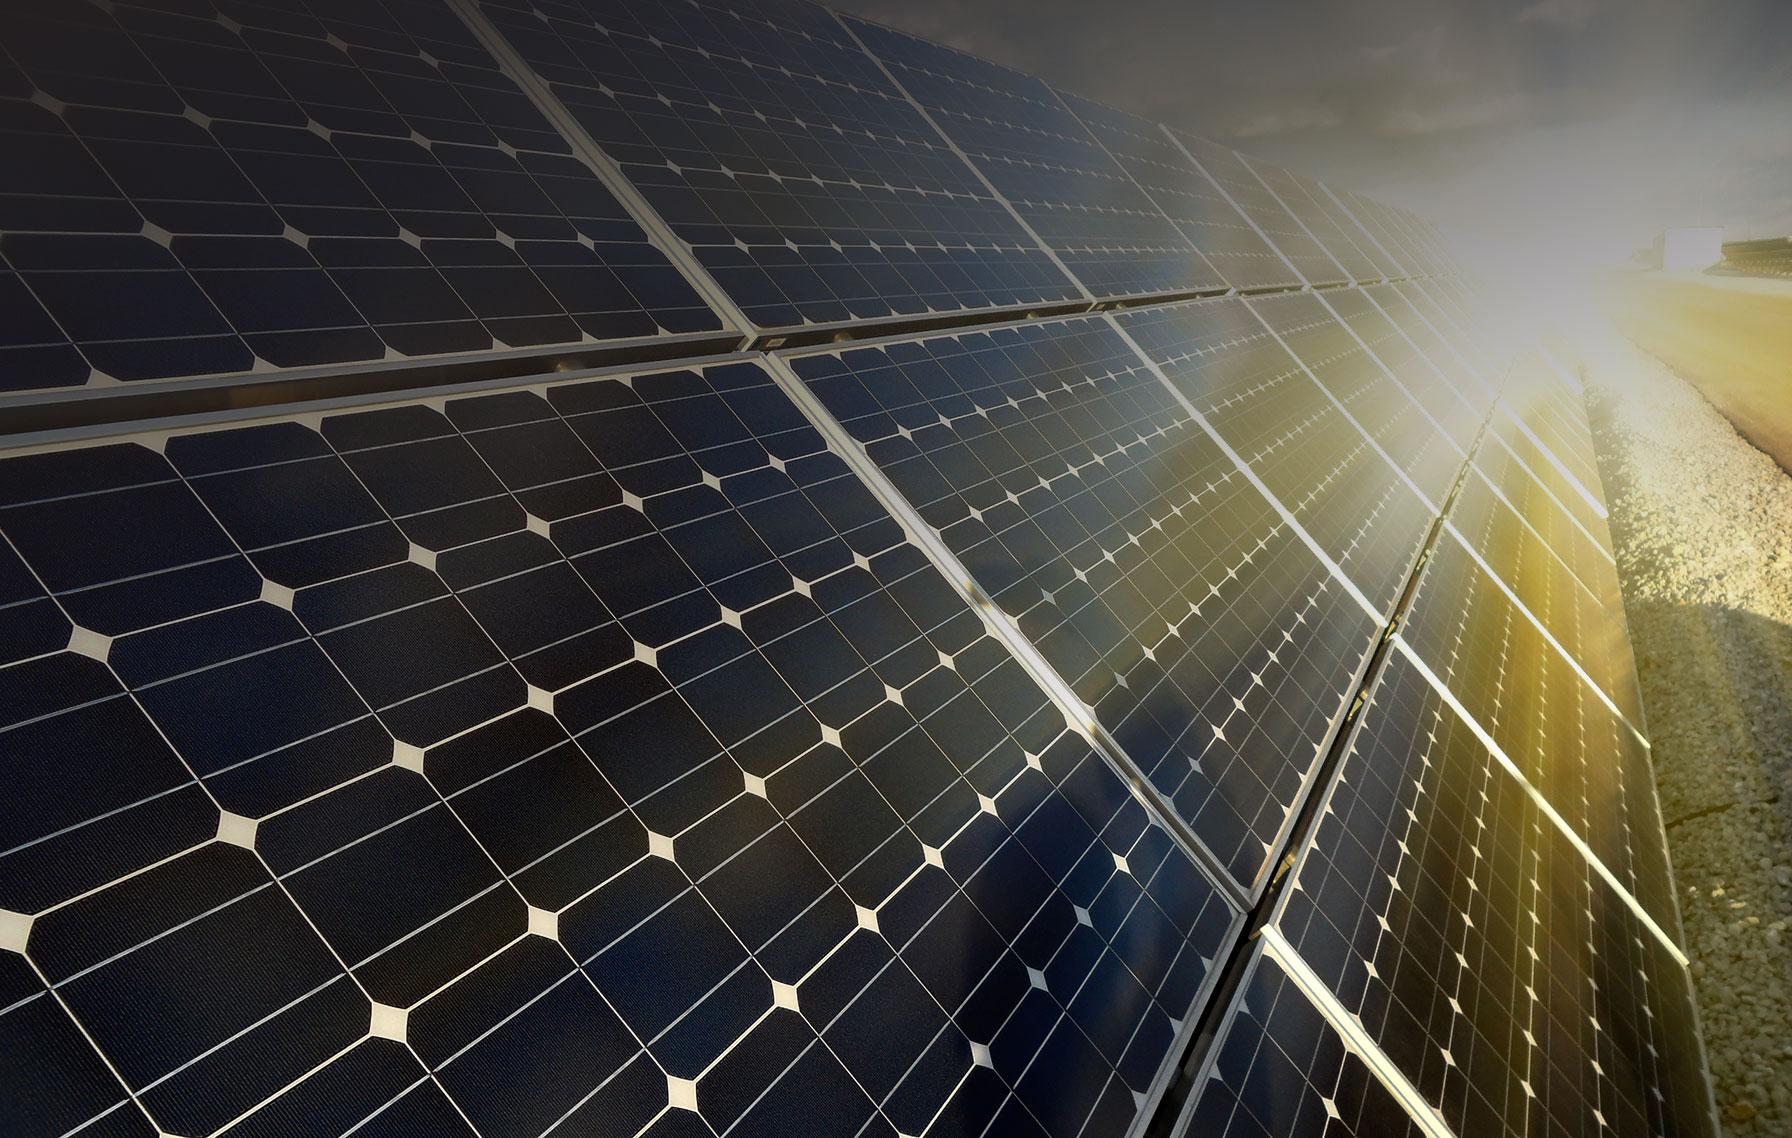 BL_solarpanel02